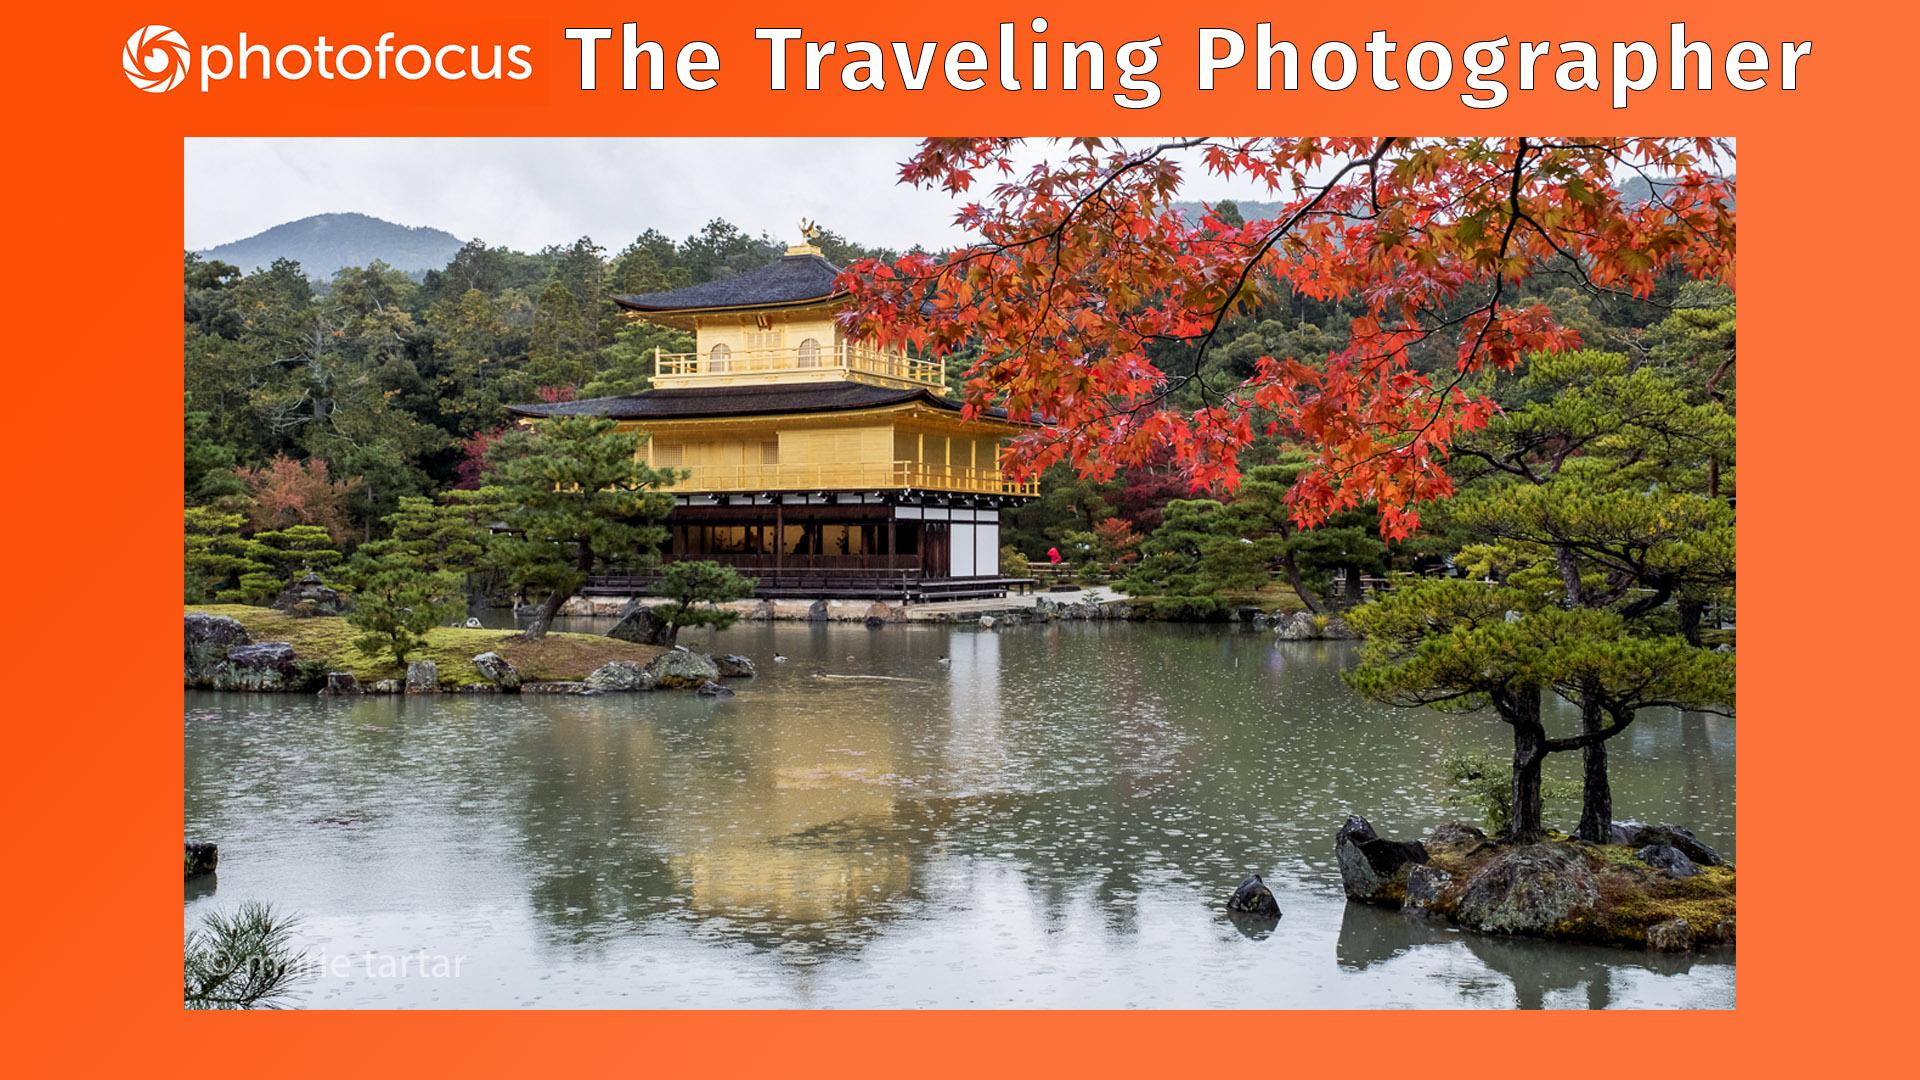 Iconic Kinkakuji, the Golden Pavilion, in Kyoto, one of Japan's most splendid World Heritage sites